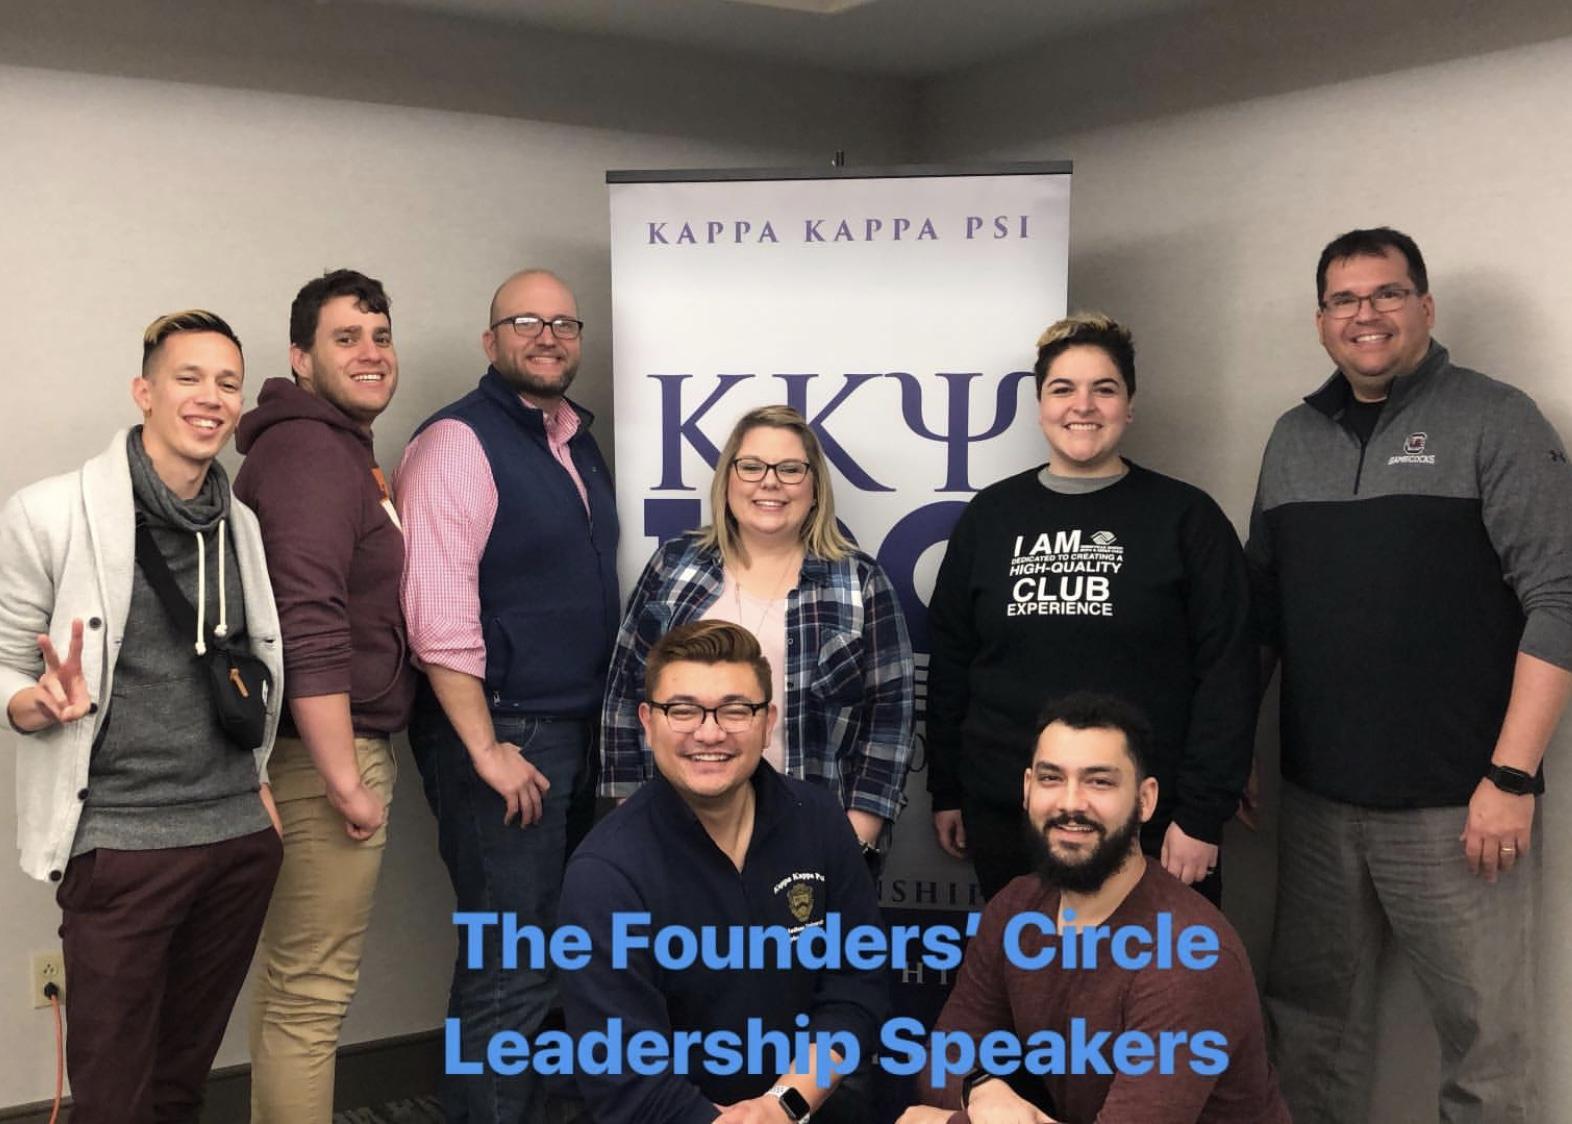 Inaugural speakers/members of the Kappa Kappa Psi Founders' Circle Leadership Development Program.